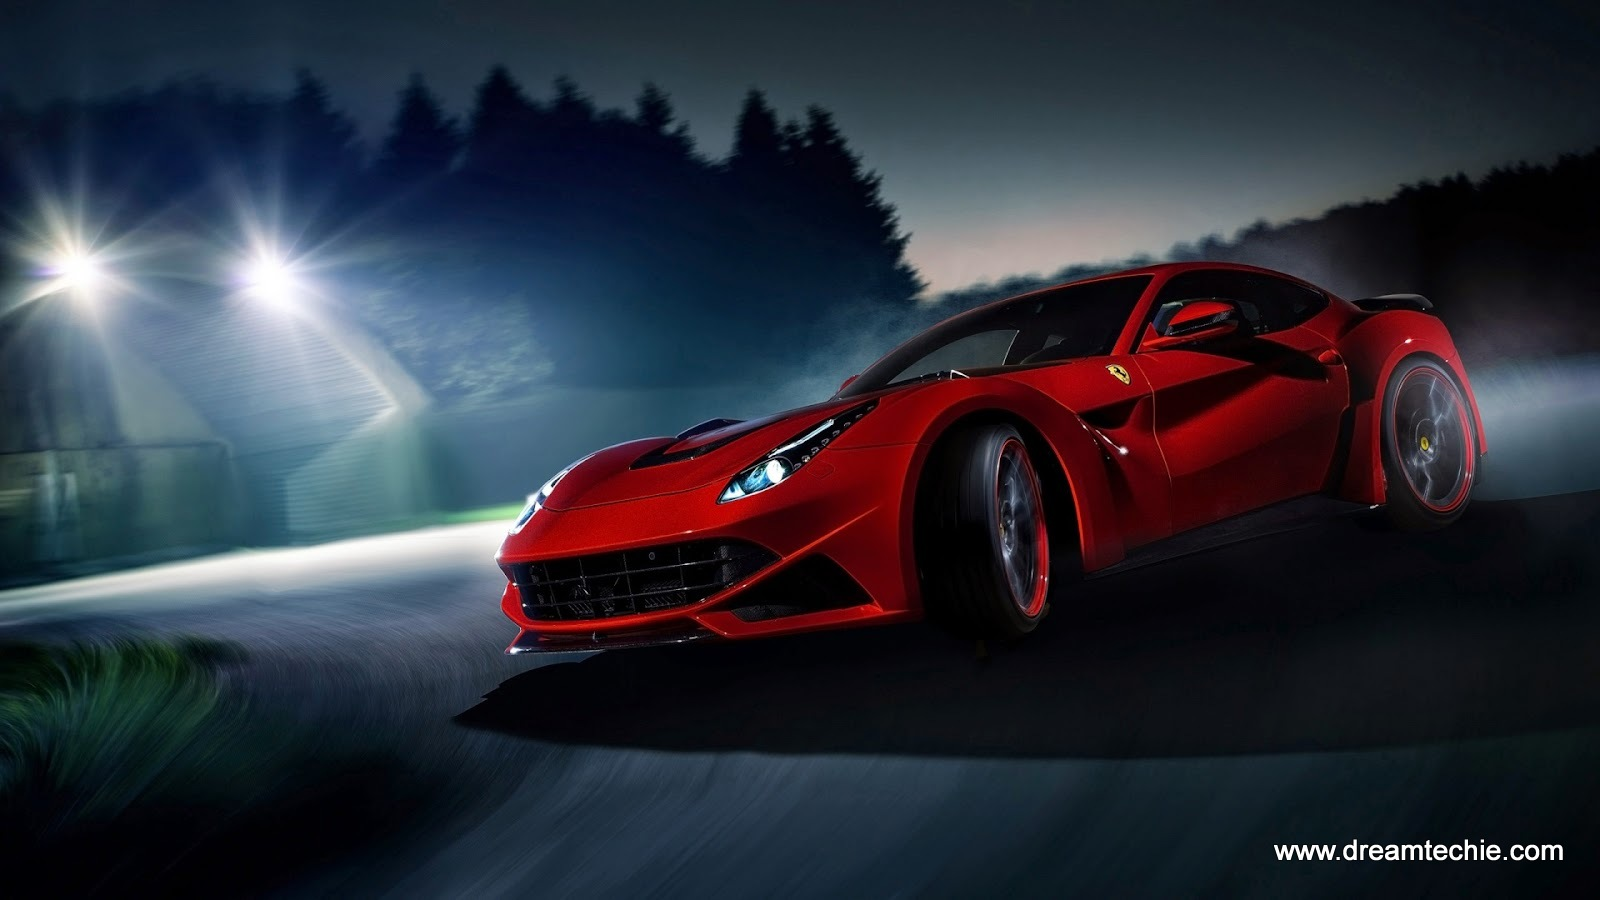 Hd wallpaper cars -  Ferrari Car Smartphone Hd Wallpaper Free Download